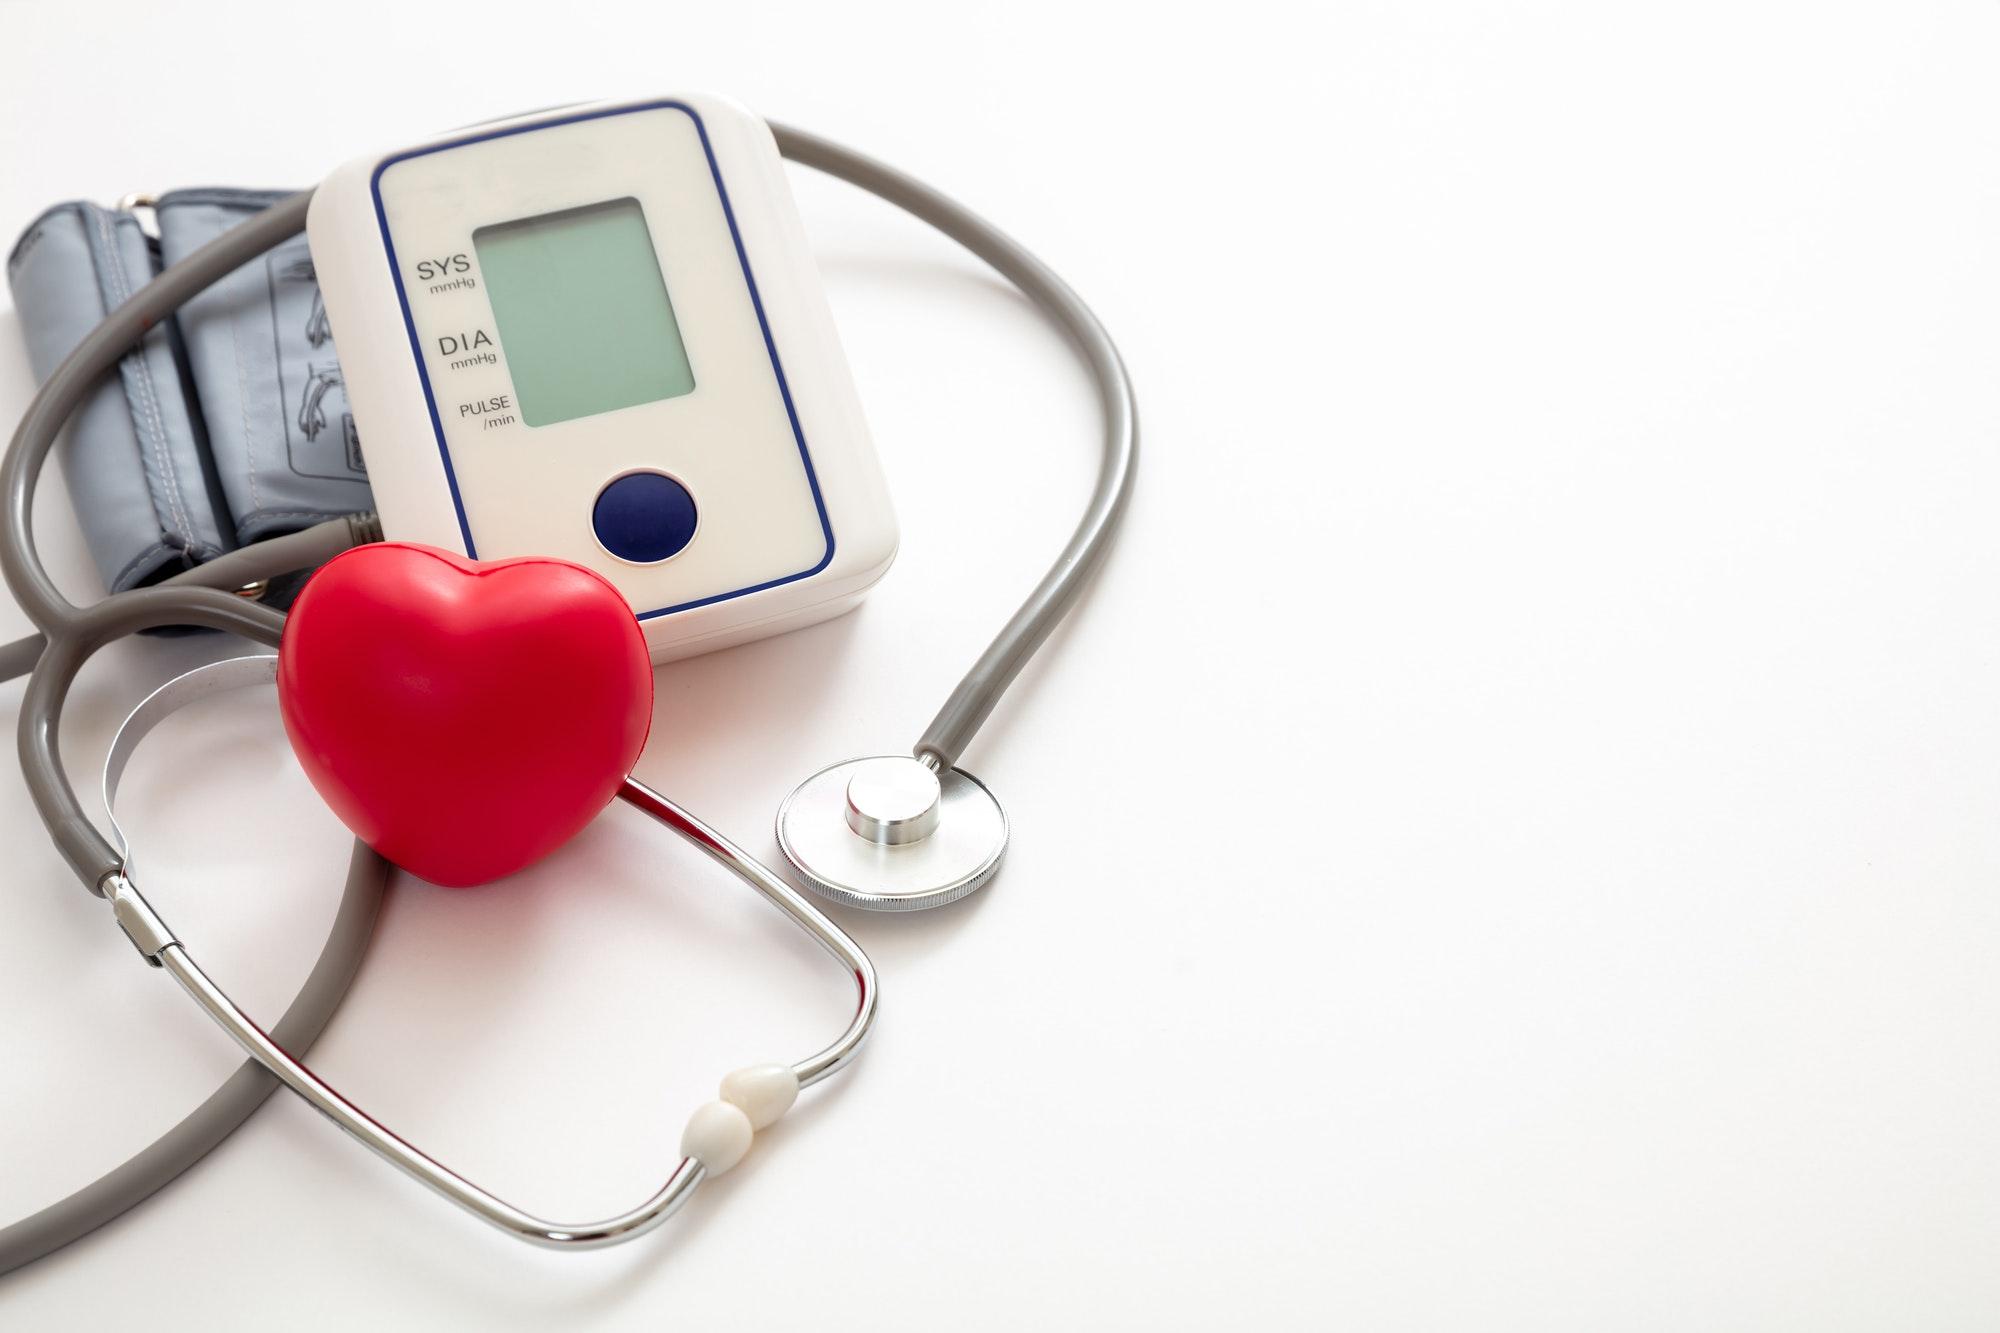 Tonómetro electrónico médico medidor de presión arterial aislado sobre fondo blanco.